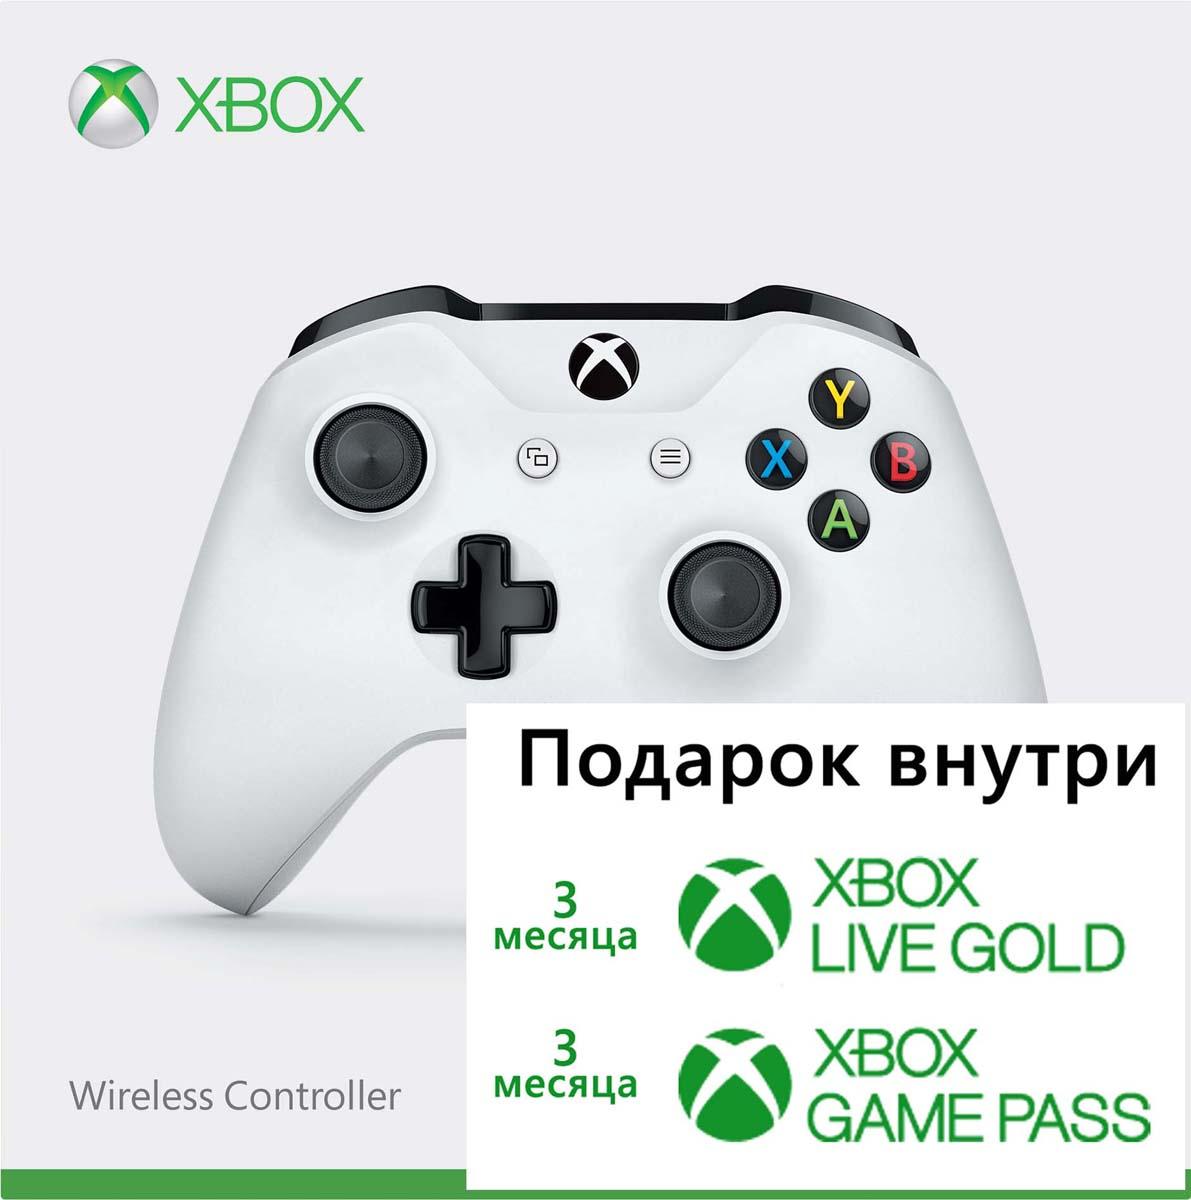 Геймпад беспроводной Microsoft Xbox One + 3м Xbox Live, 3м Game Pass, 41837, белый зарядная станция с 2 я аккумуляторами black horns для геймпадов xbox one